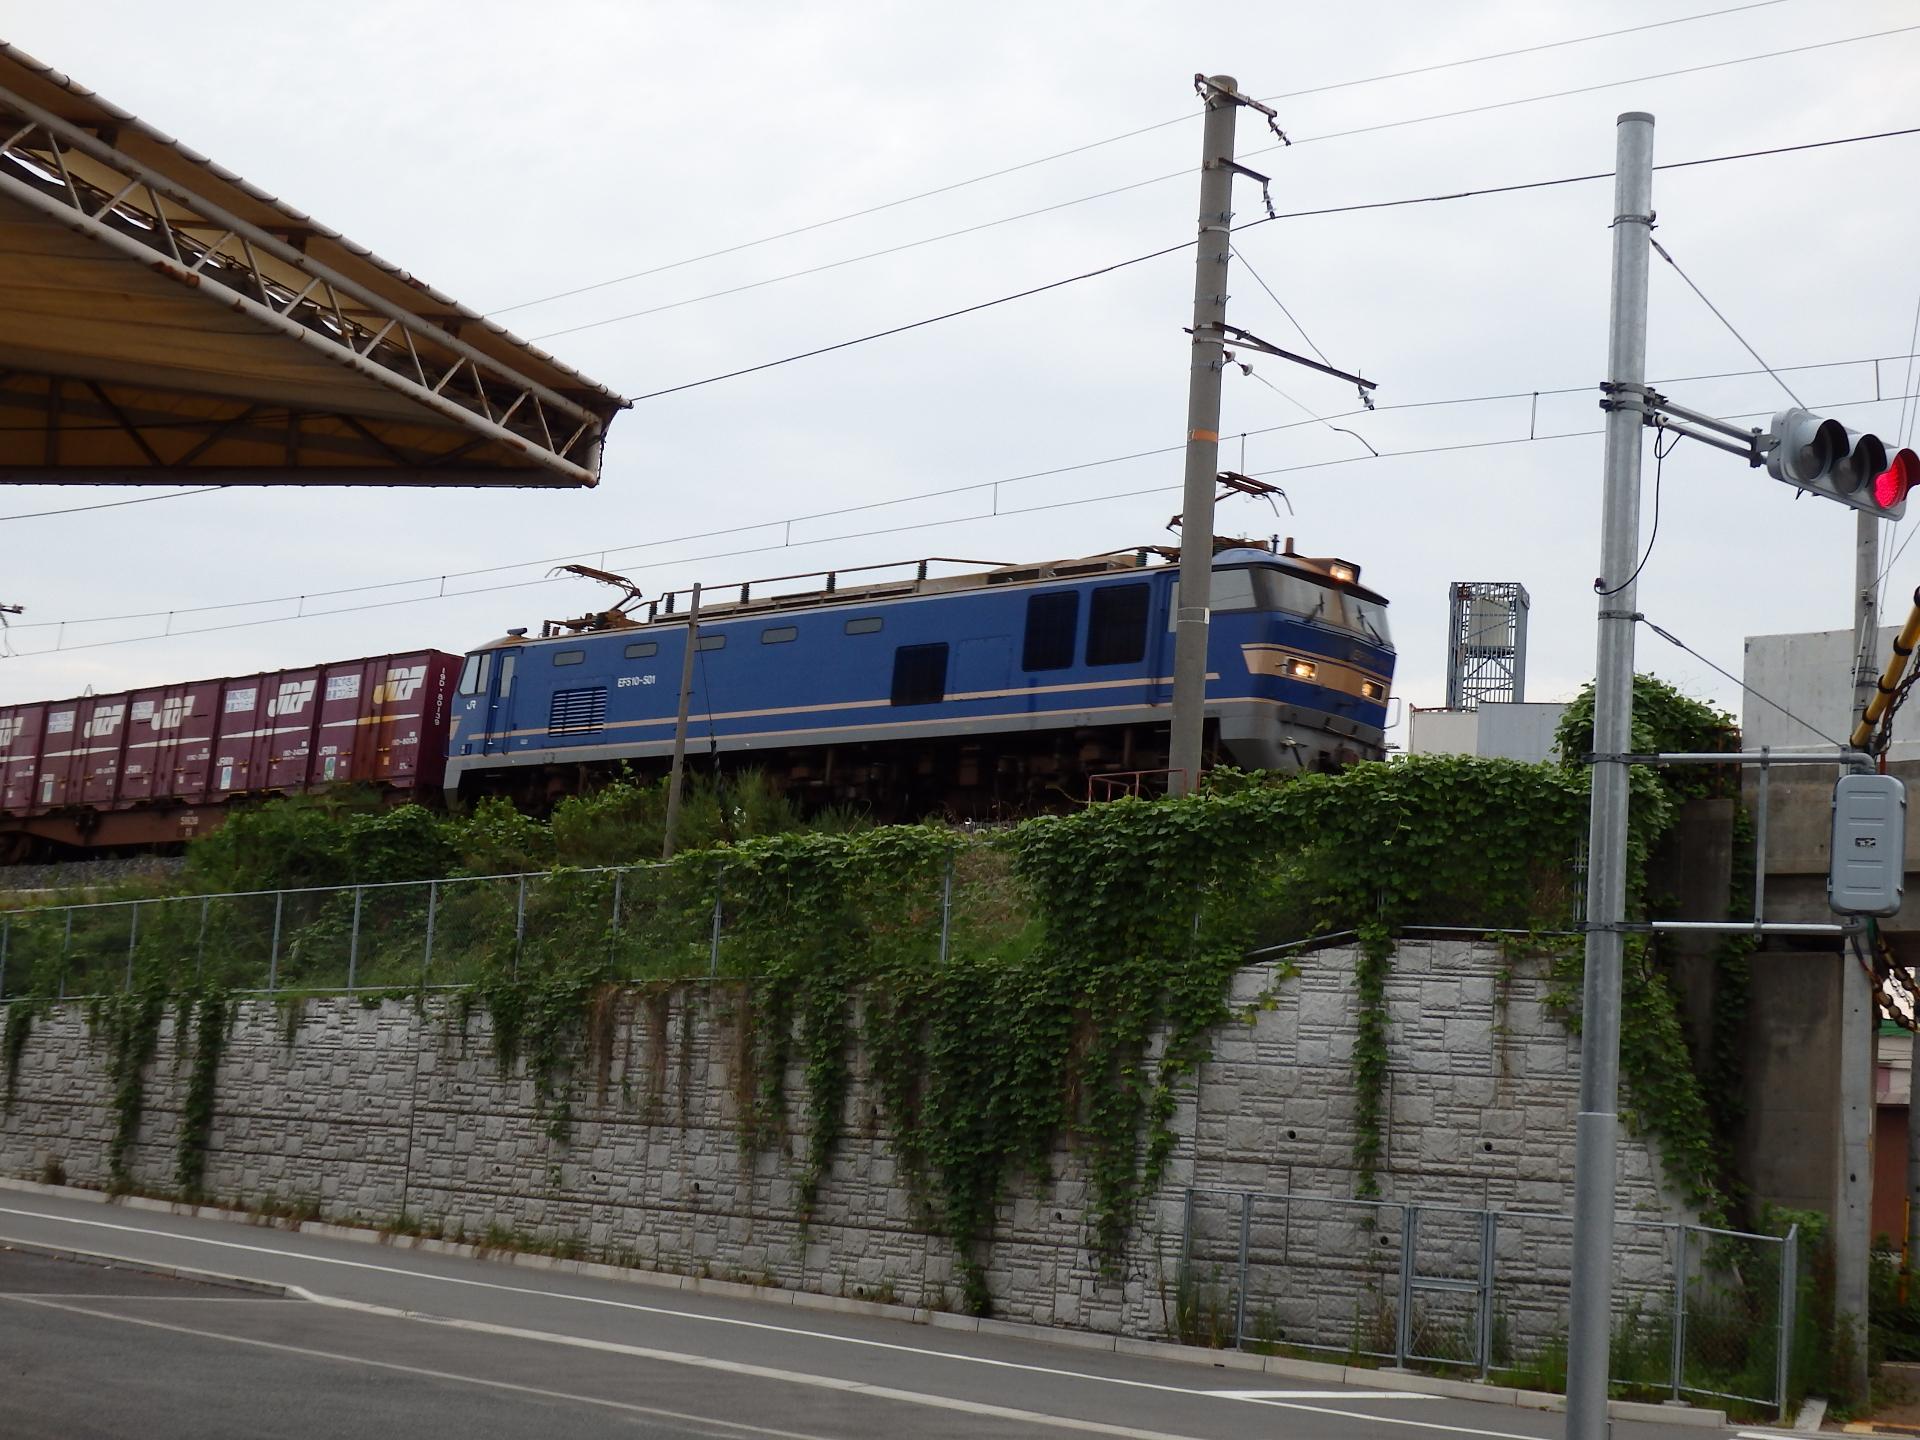 EF510-501が牽引するコンテナ貨物列車です。